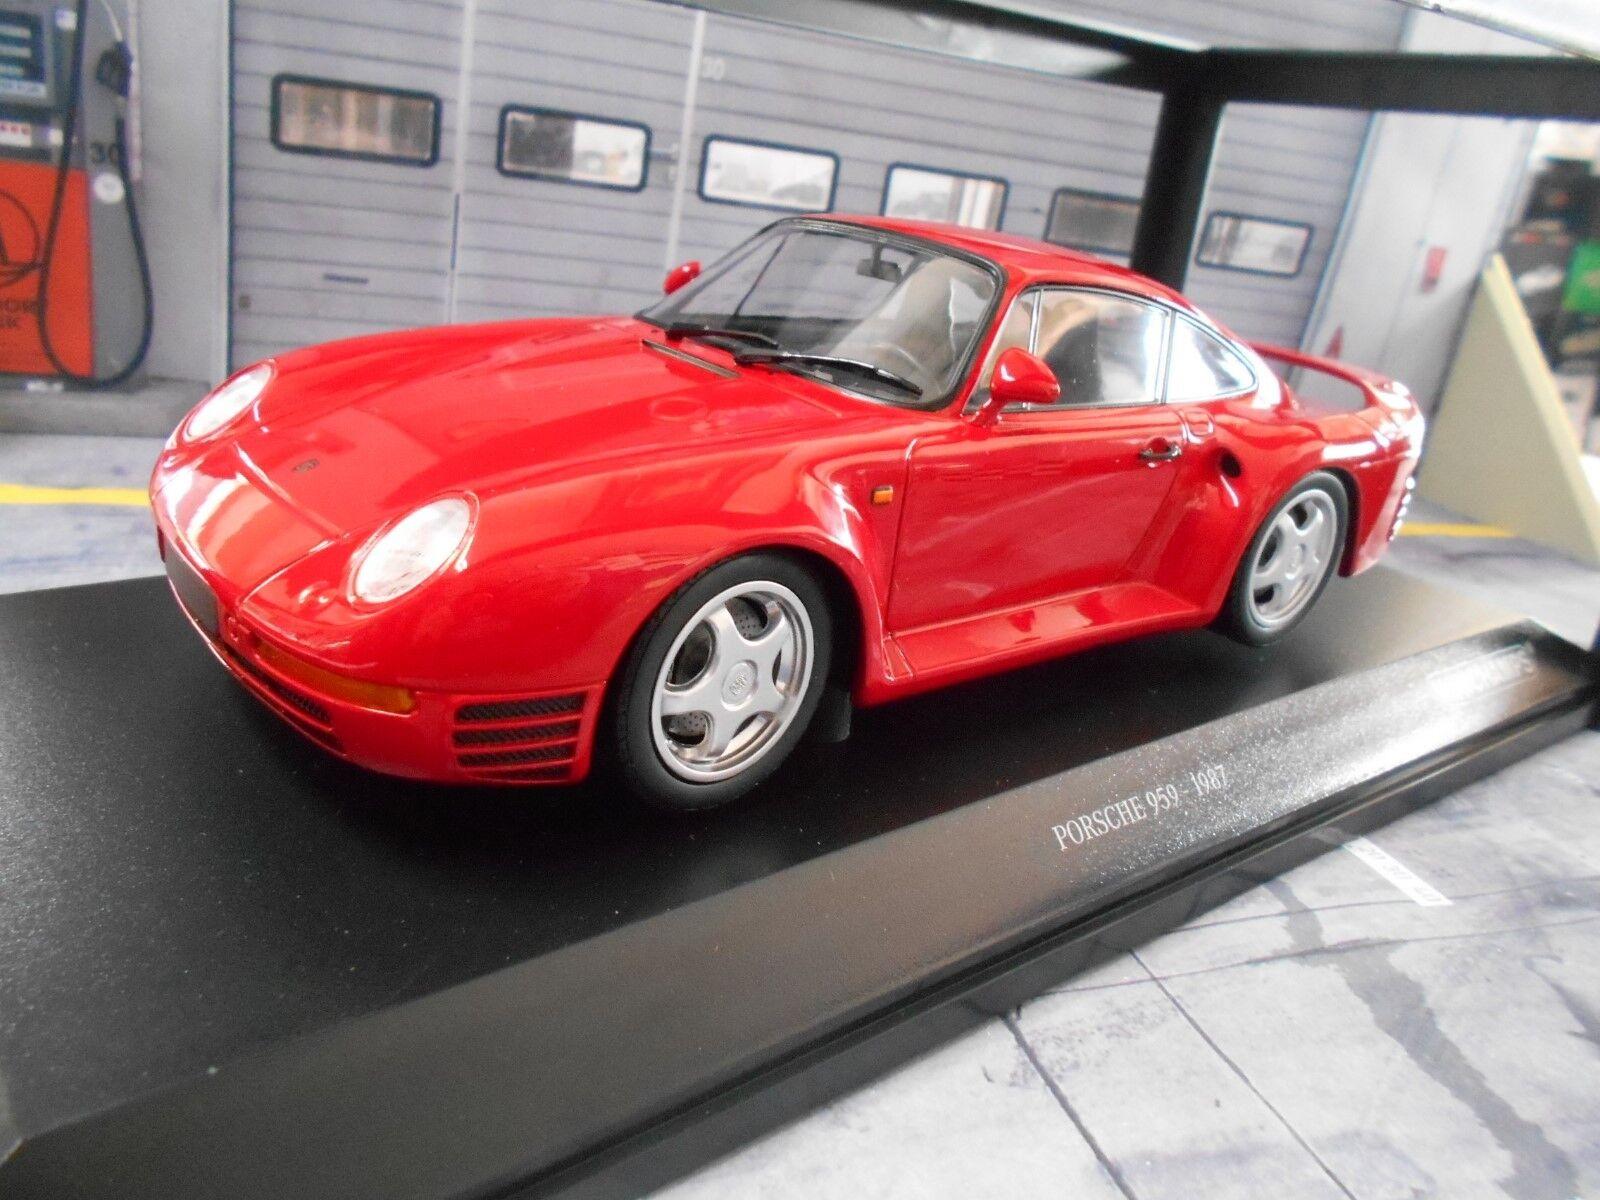 PORSCHE 959 4x4 MIS. B COUPE rosso ROSSO 1987 NEW NEW NEW NUOVO Minichamps 1 18 d19dcf